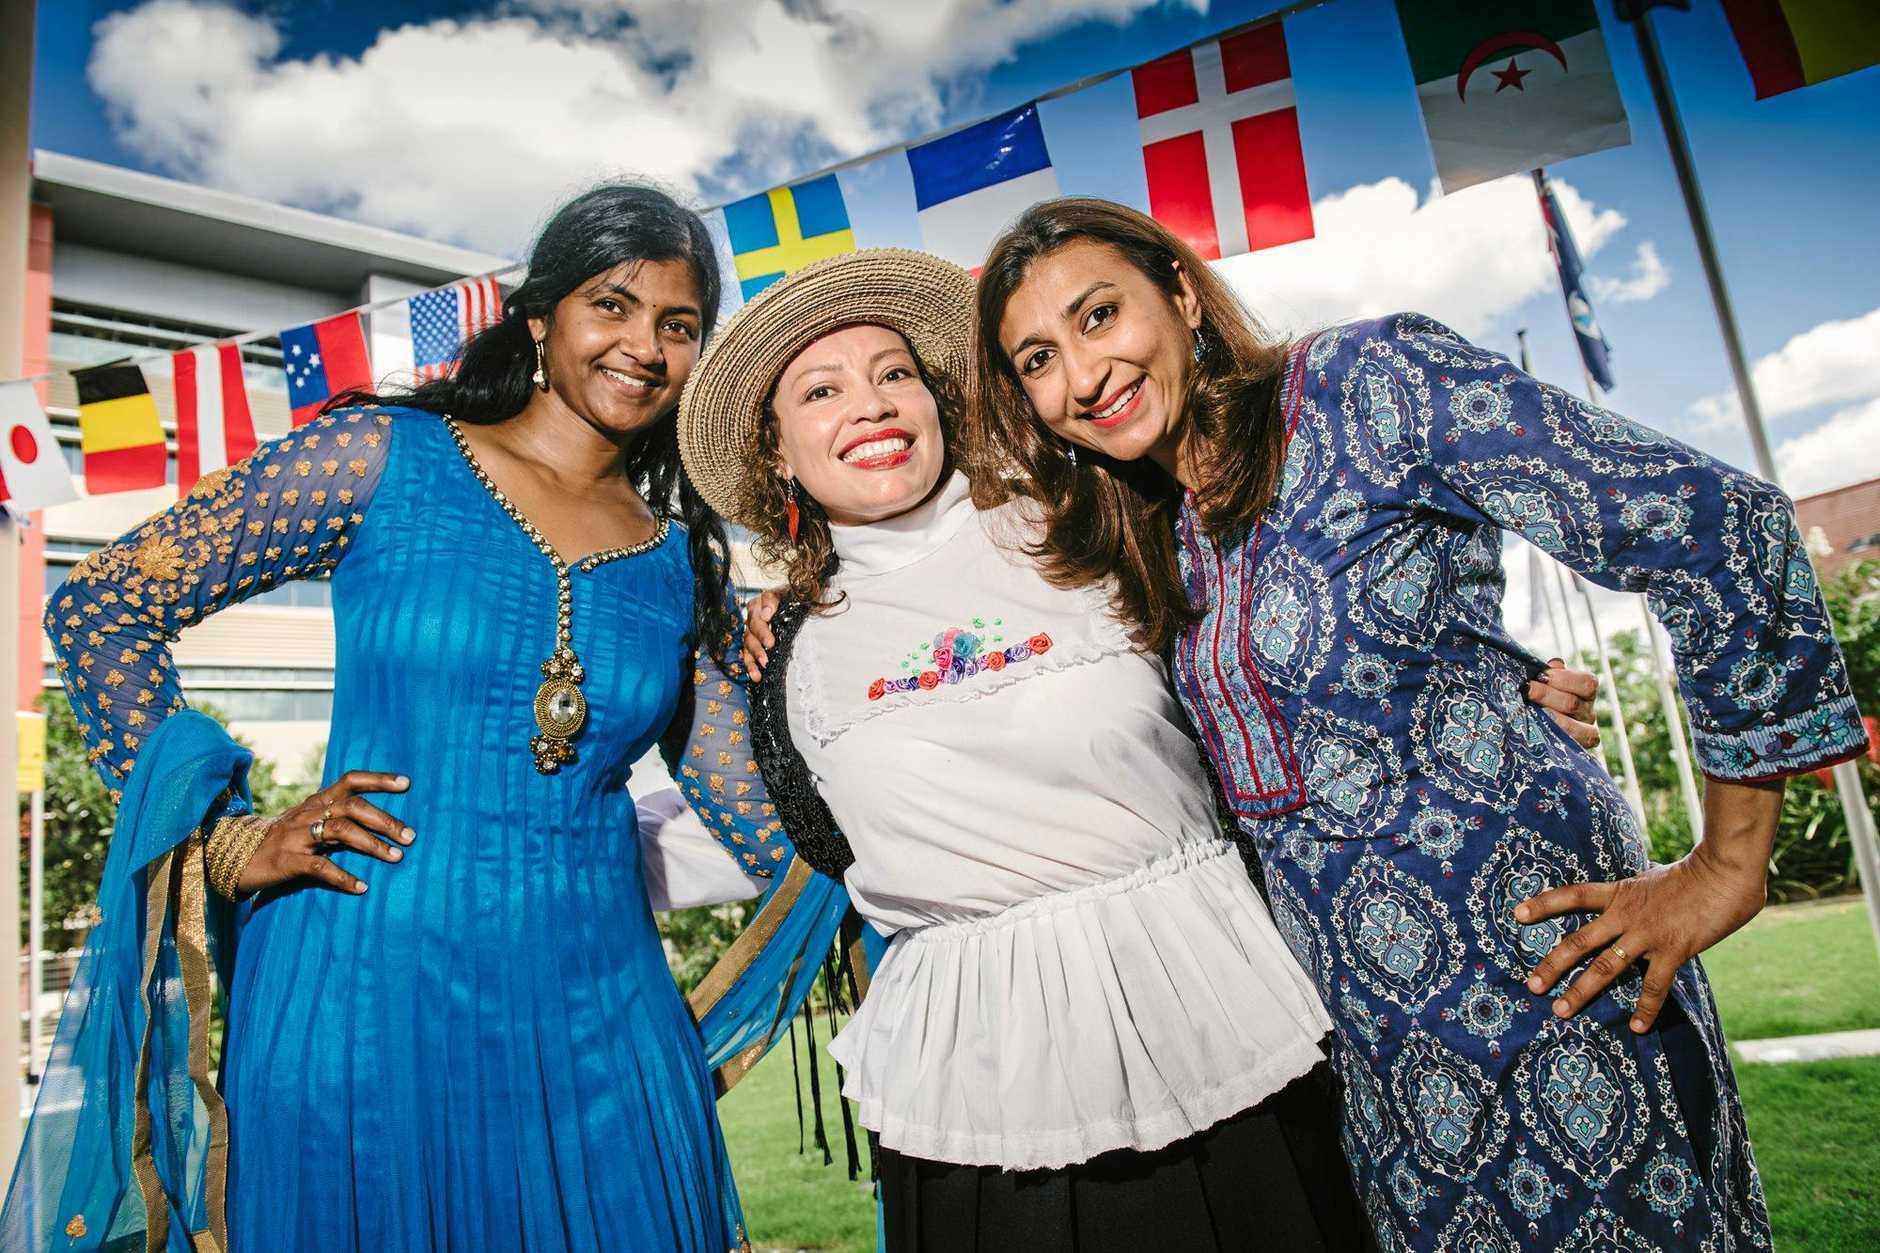 (L to R) Niyati Raval, Ranikanth Sadanala and Yira Nurey Cortes Mora celebrate Harmony Day at USQ Springfield.